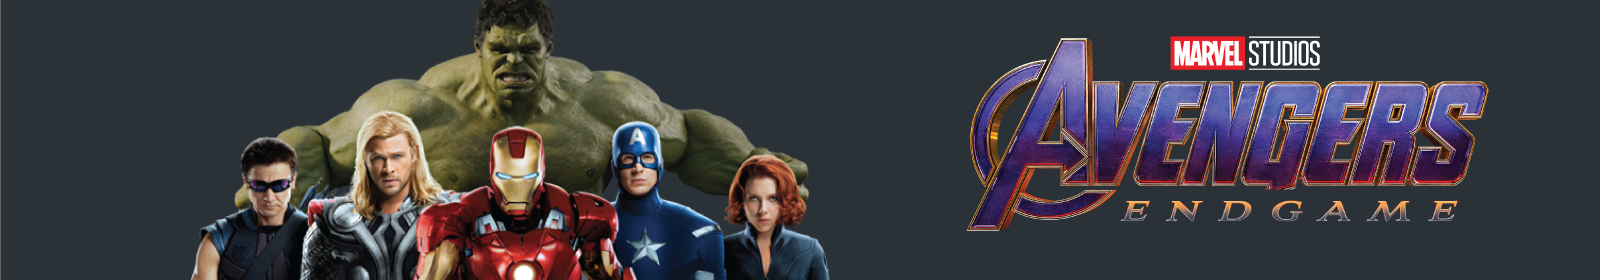 comprar avengers online iron man capitao america hulk thor